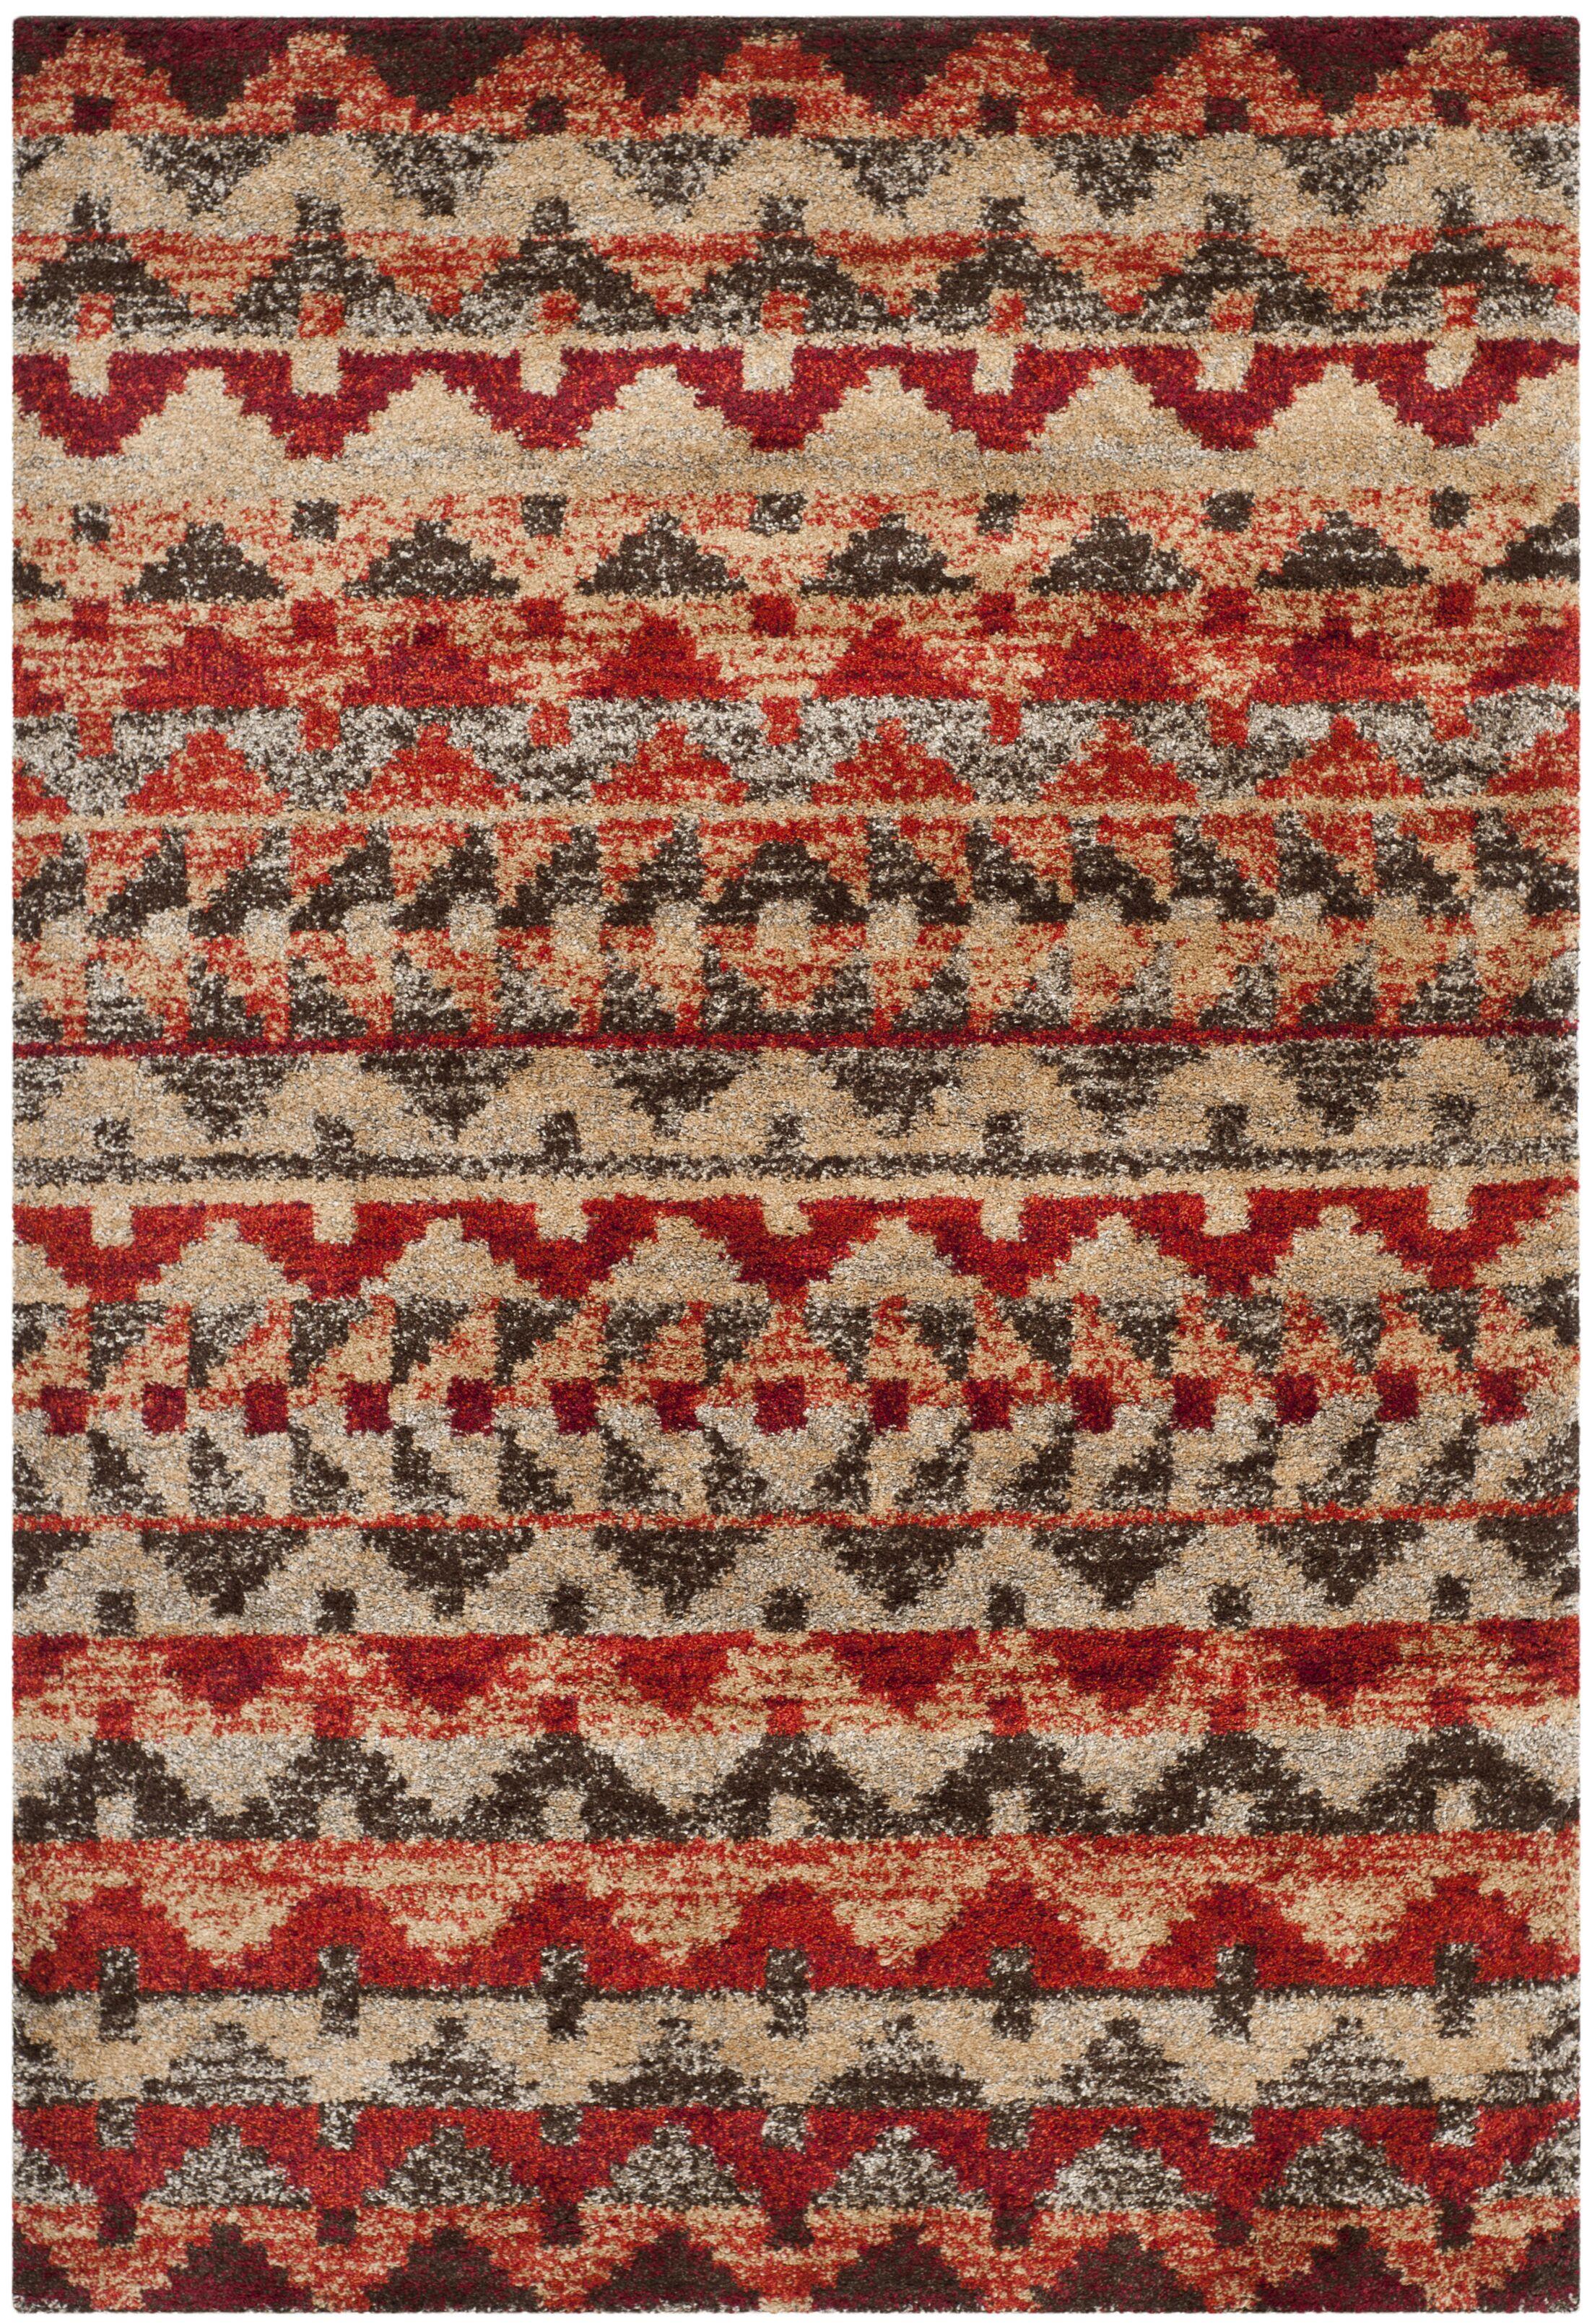 Tahoe Brown / Terracotta Geometric Rug Rug Size: Rectangle 5'1